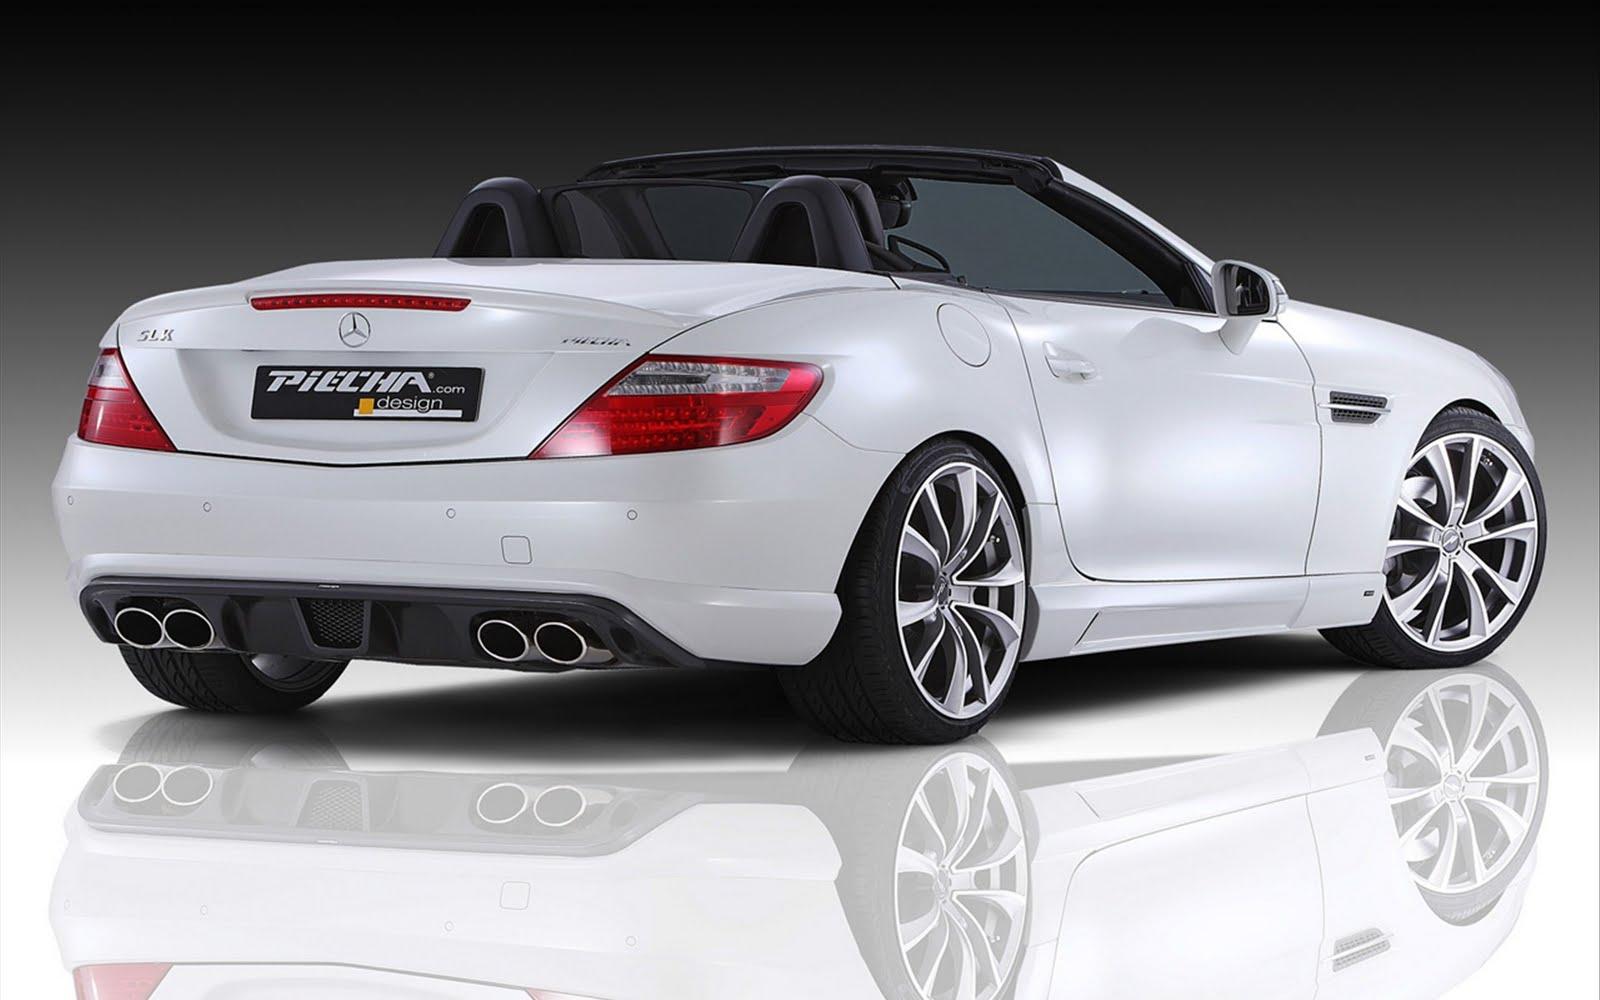 http://4.bp.blogspot.com/-pBVOxKxugRw/TdE4QvjWTBI/AAAAAAAABAU/S3EYuMbeSik/s1600/PIECHA-Design-Mercedes-Benz-SLK-R172-Accurian-RS-2011-widescreen-06.jpg